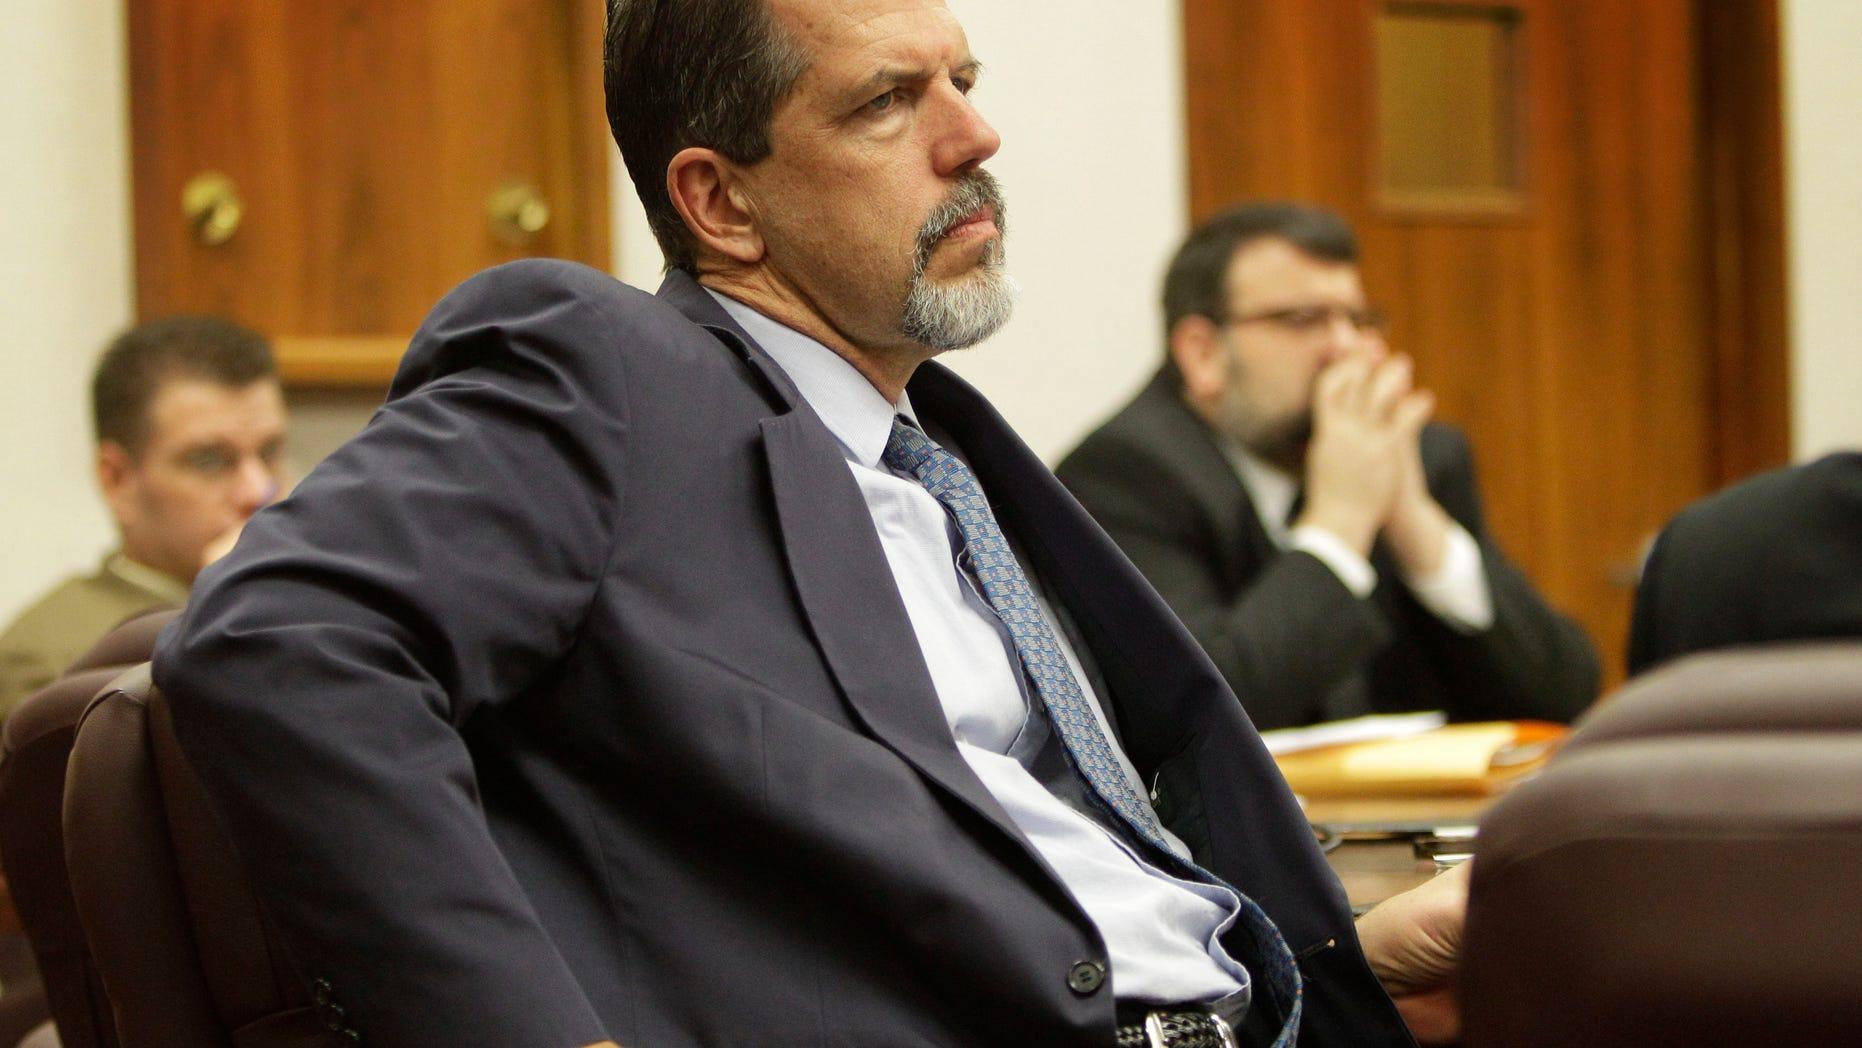 November 18, 2010: Asst. Attorney General Barry Disney prosecutes the Adam Longoria trail in Great Bend, Kansas.